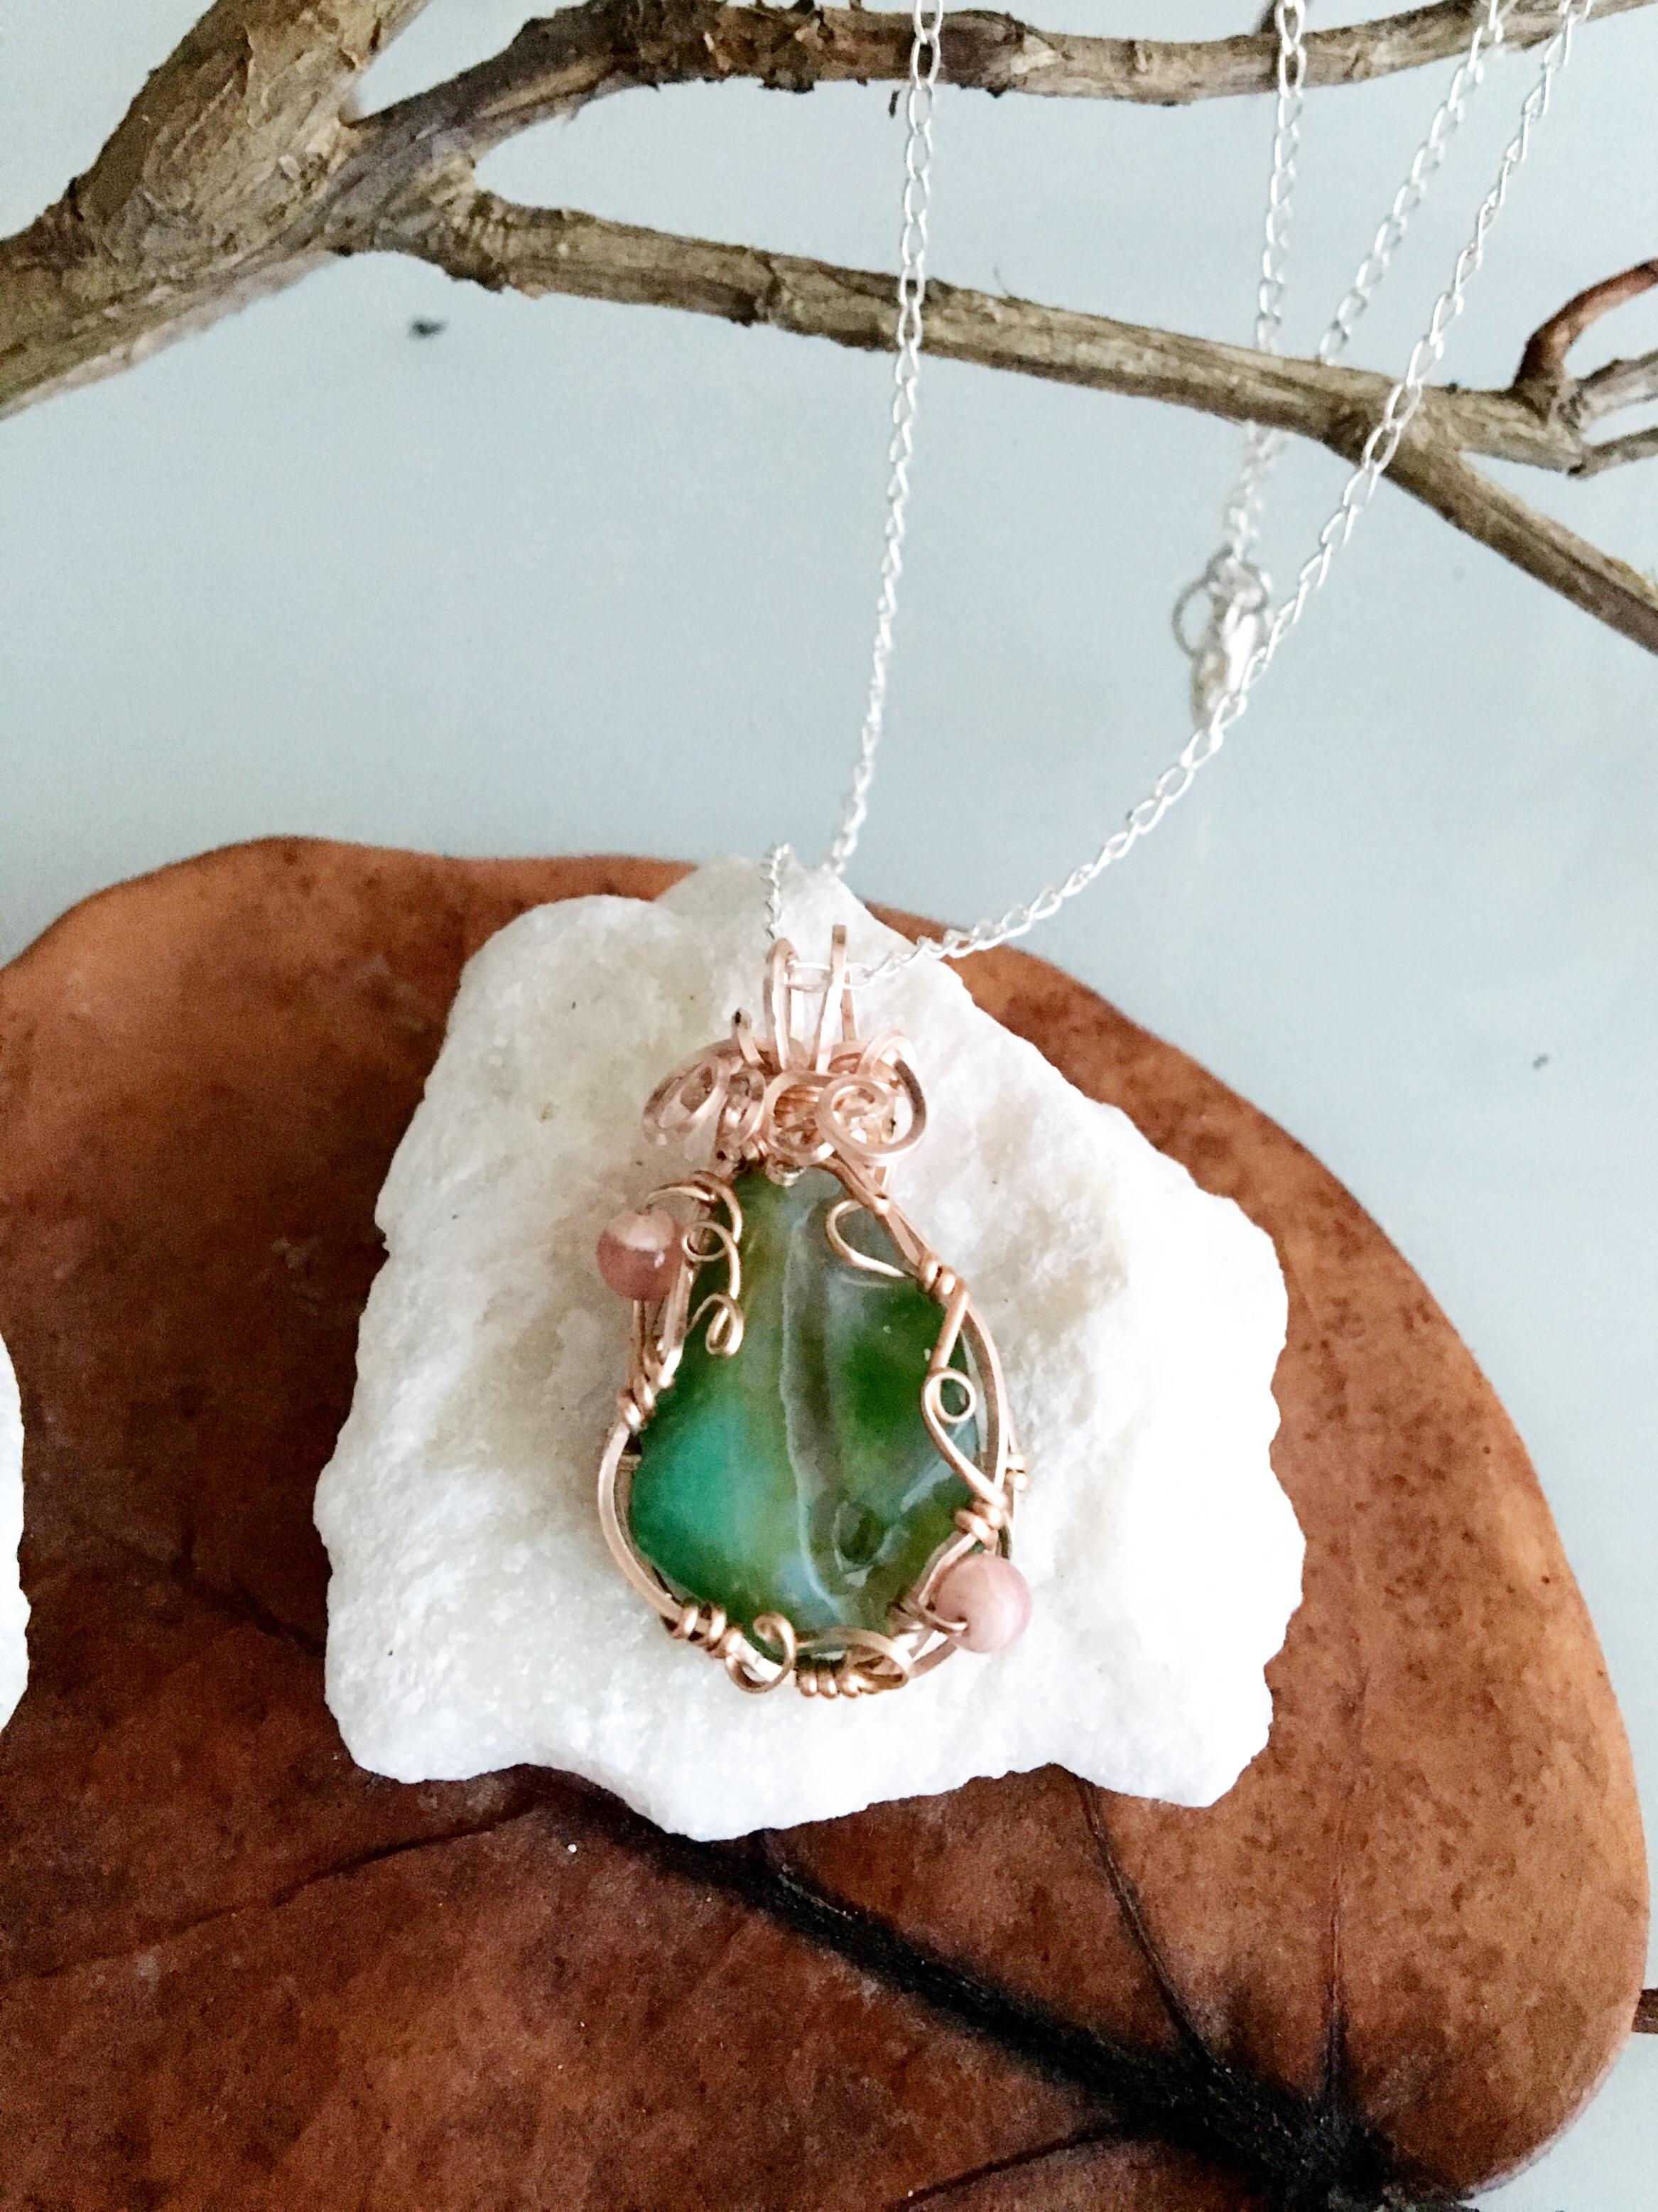 Qhresnna Quartz Necklace - Green Agathe aventurine and Rhodocrosite - Silver Plated